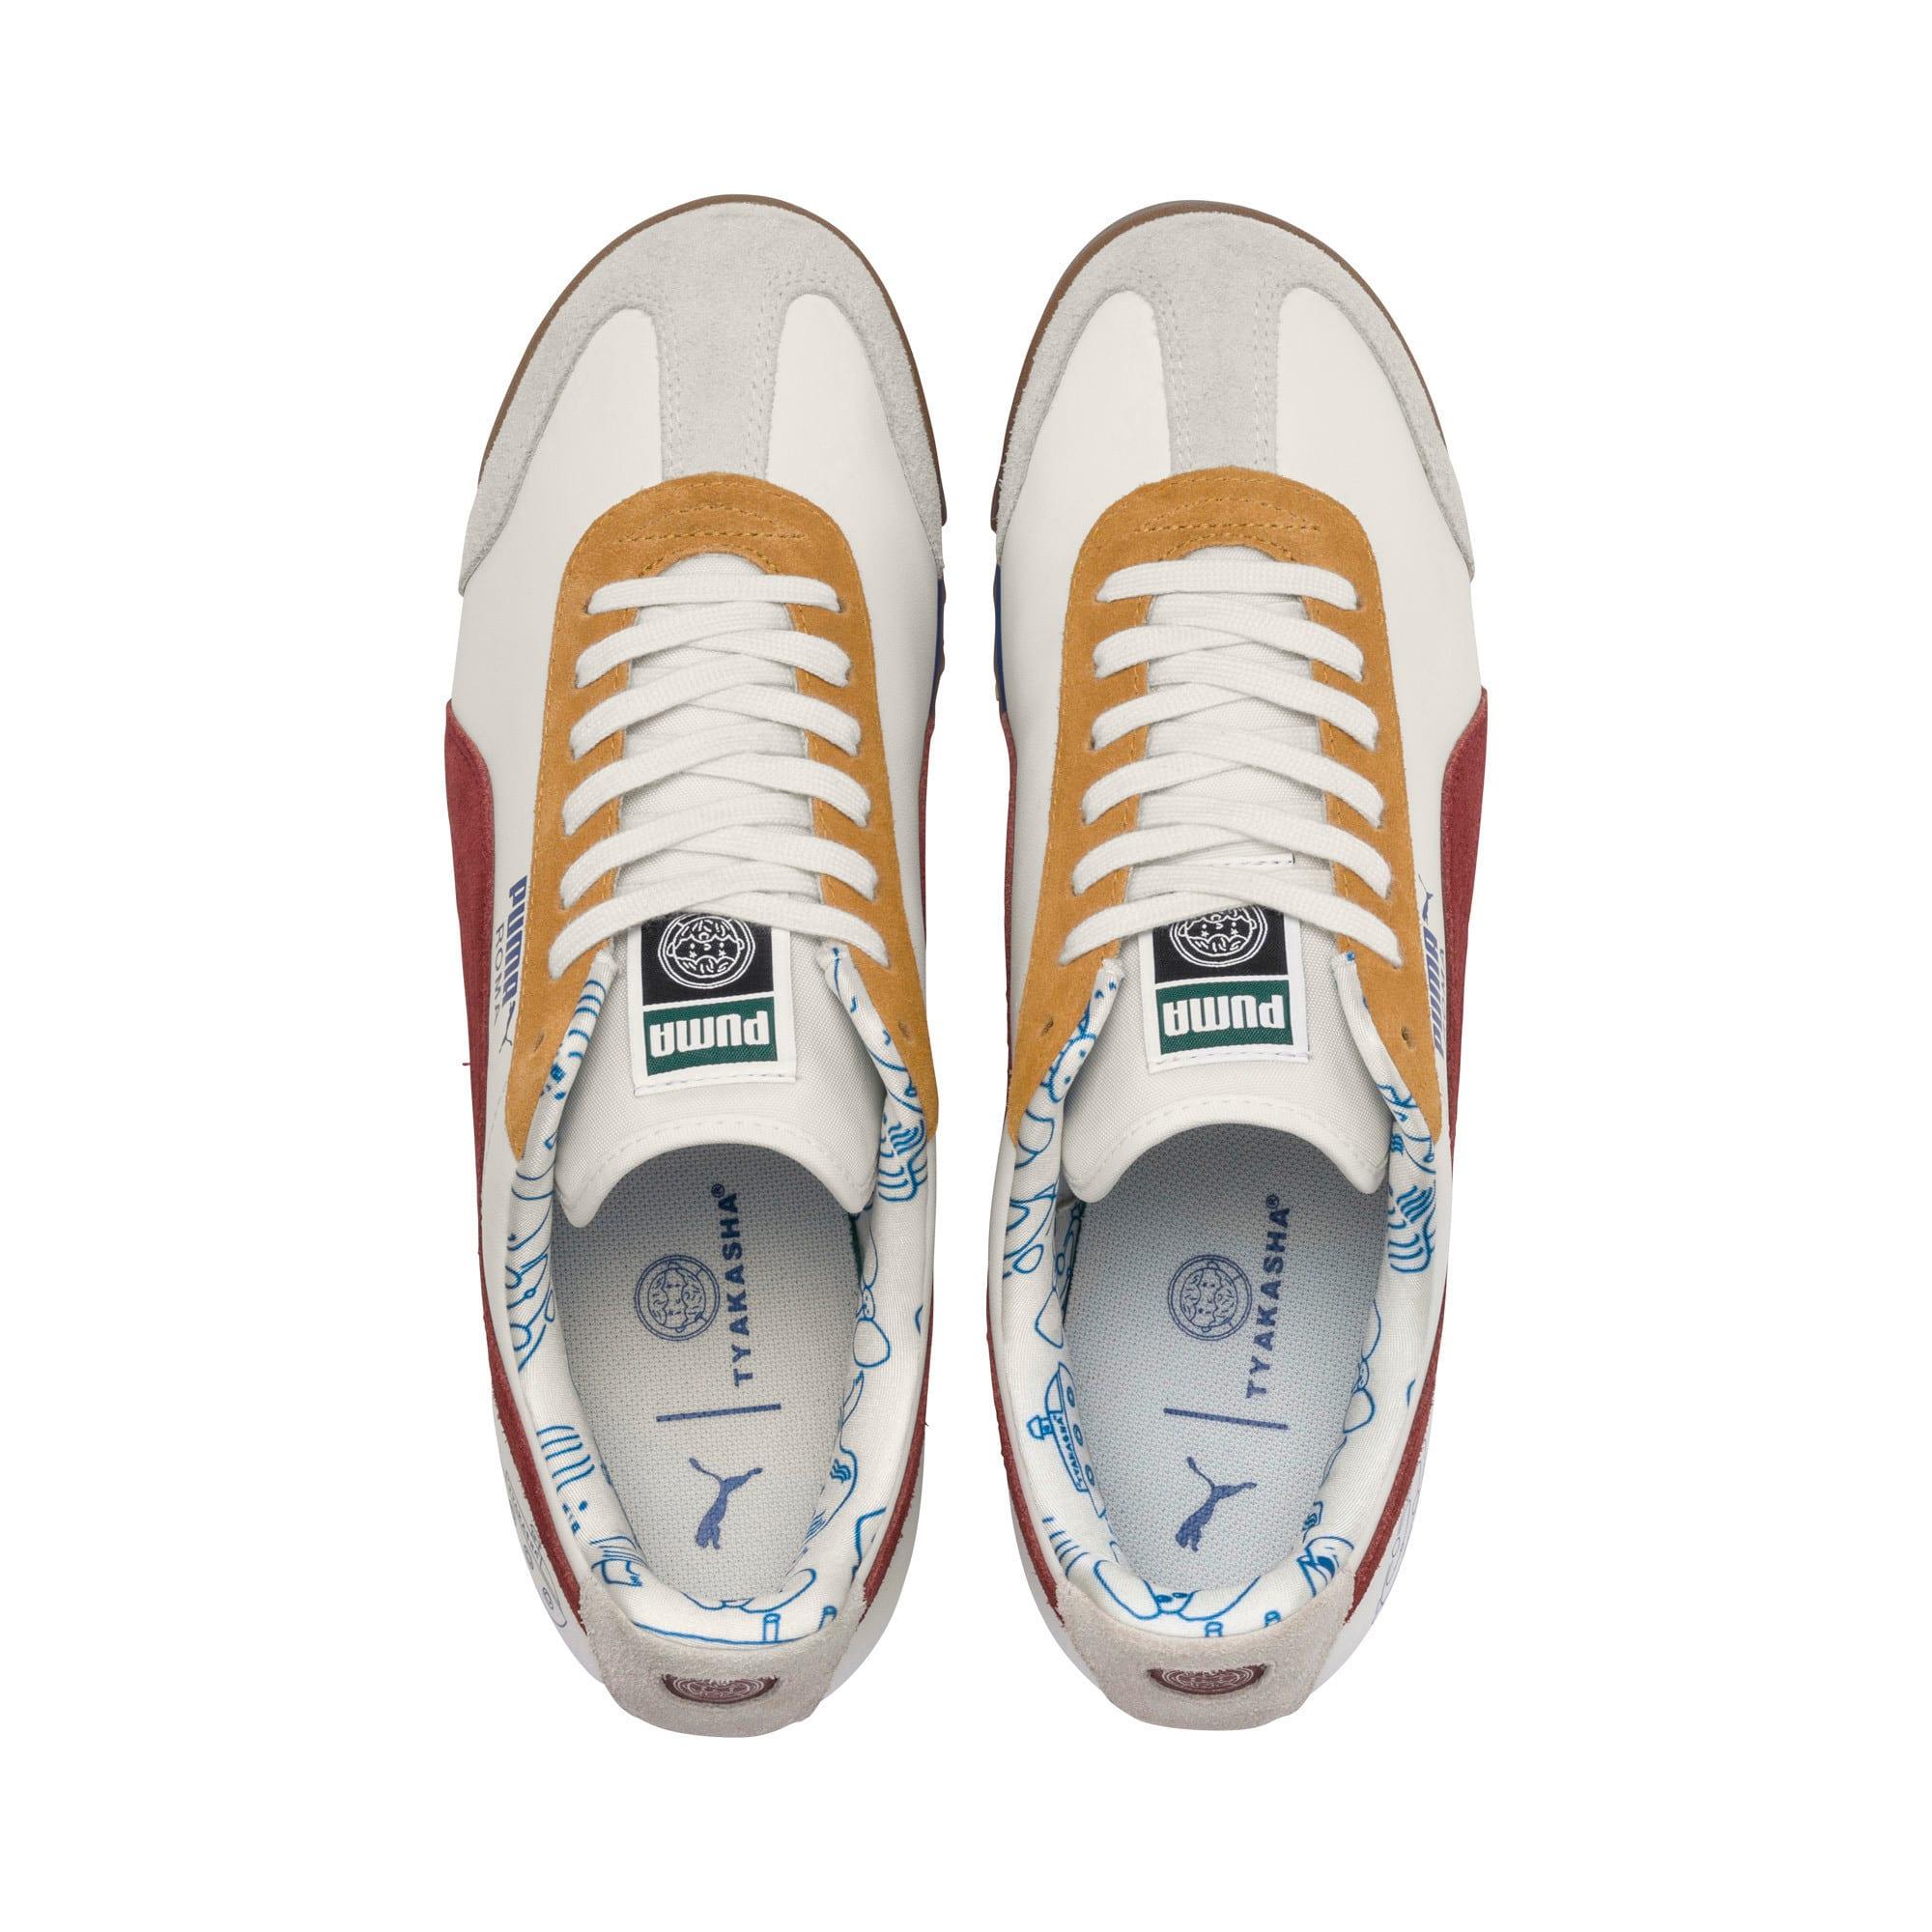 Thumbnail 8 of PUMA x TYAKASHA Roma Sneakers, Marshmallow-Fired Brick, medium